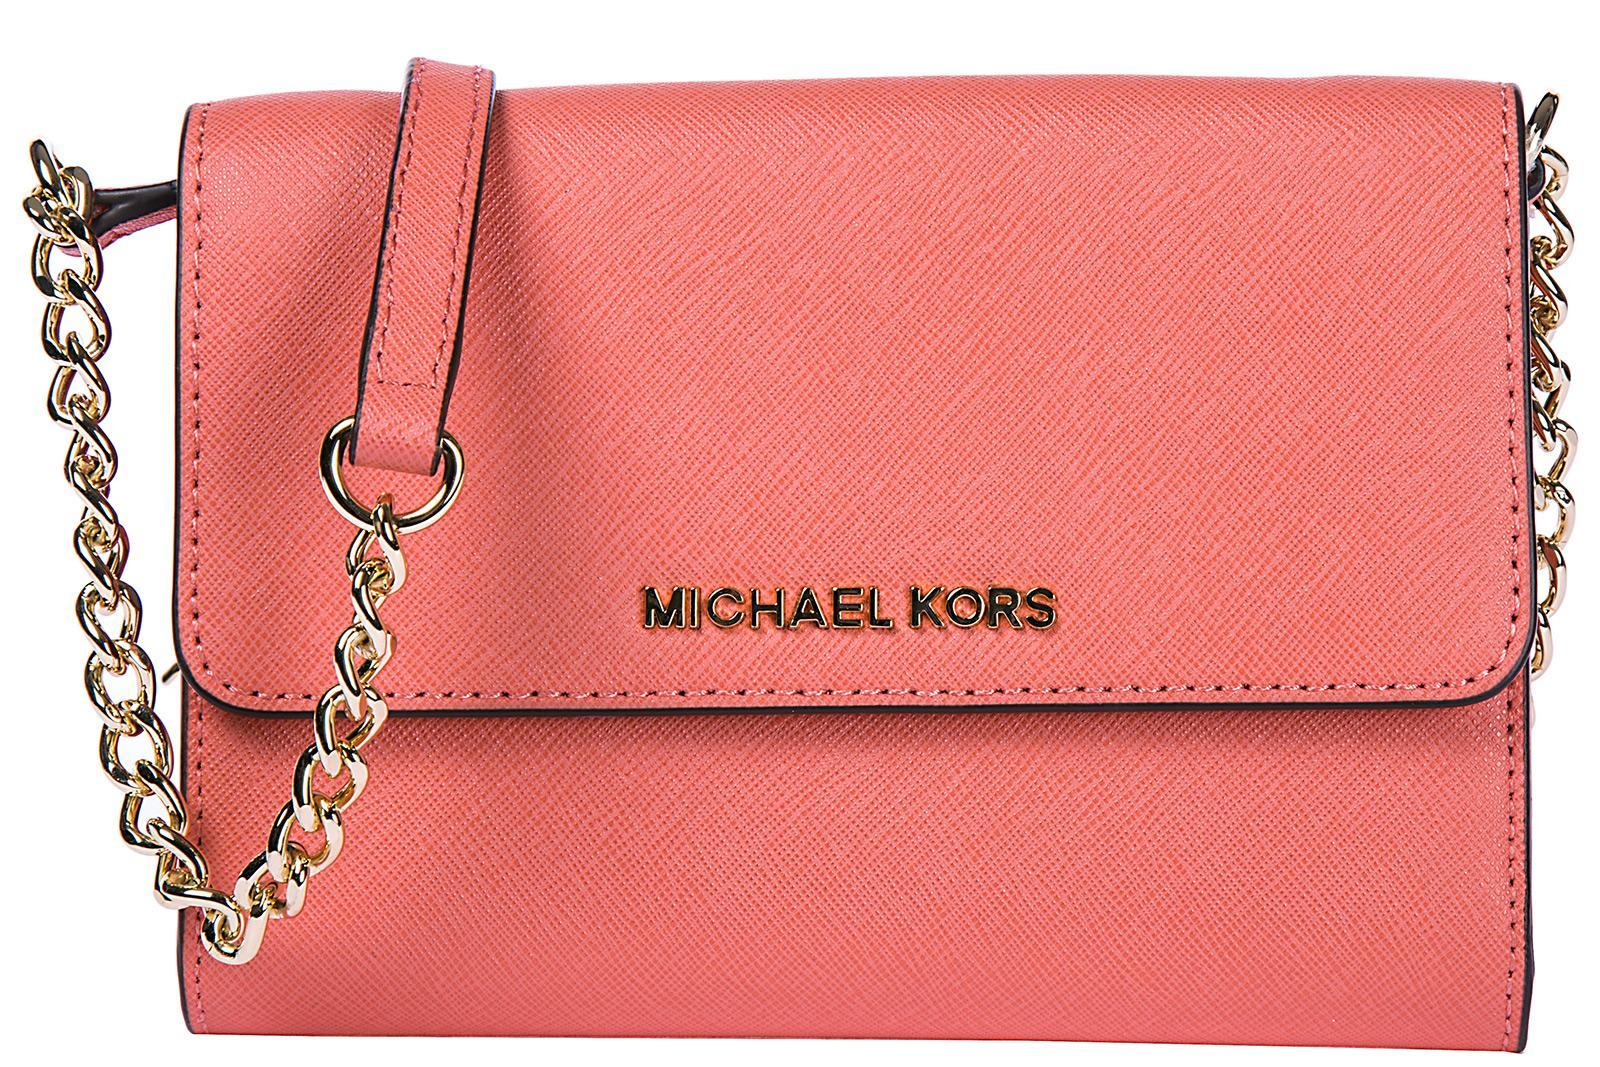 Michael Kors Women's Clutch With Shoulder Strap Handbag Bag Purse  Jet Set Travel Lg Phone Crossbody In Pink